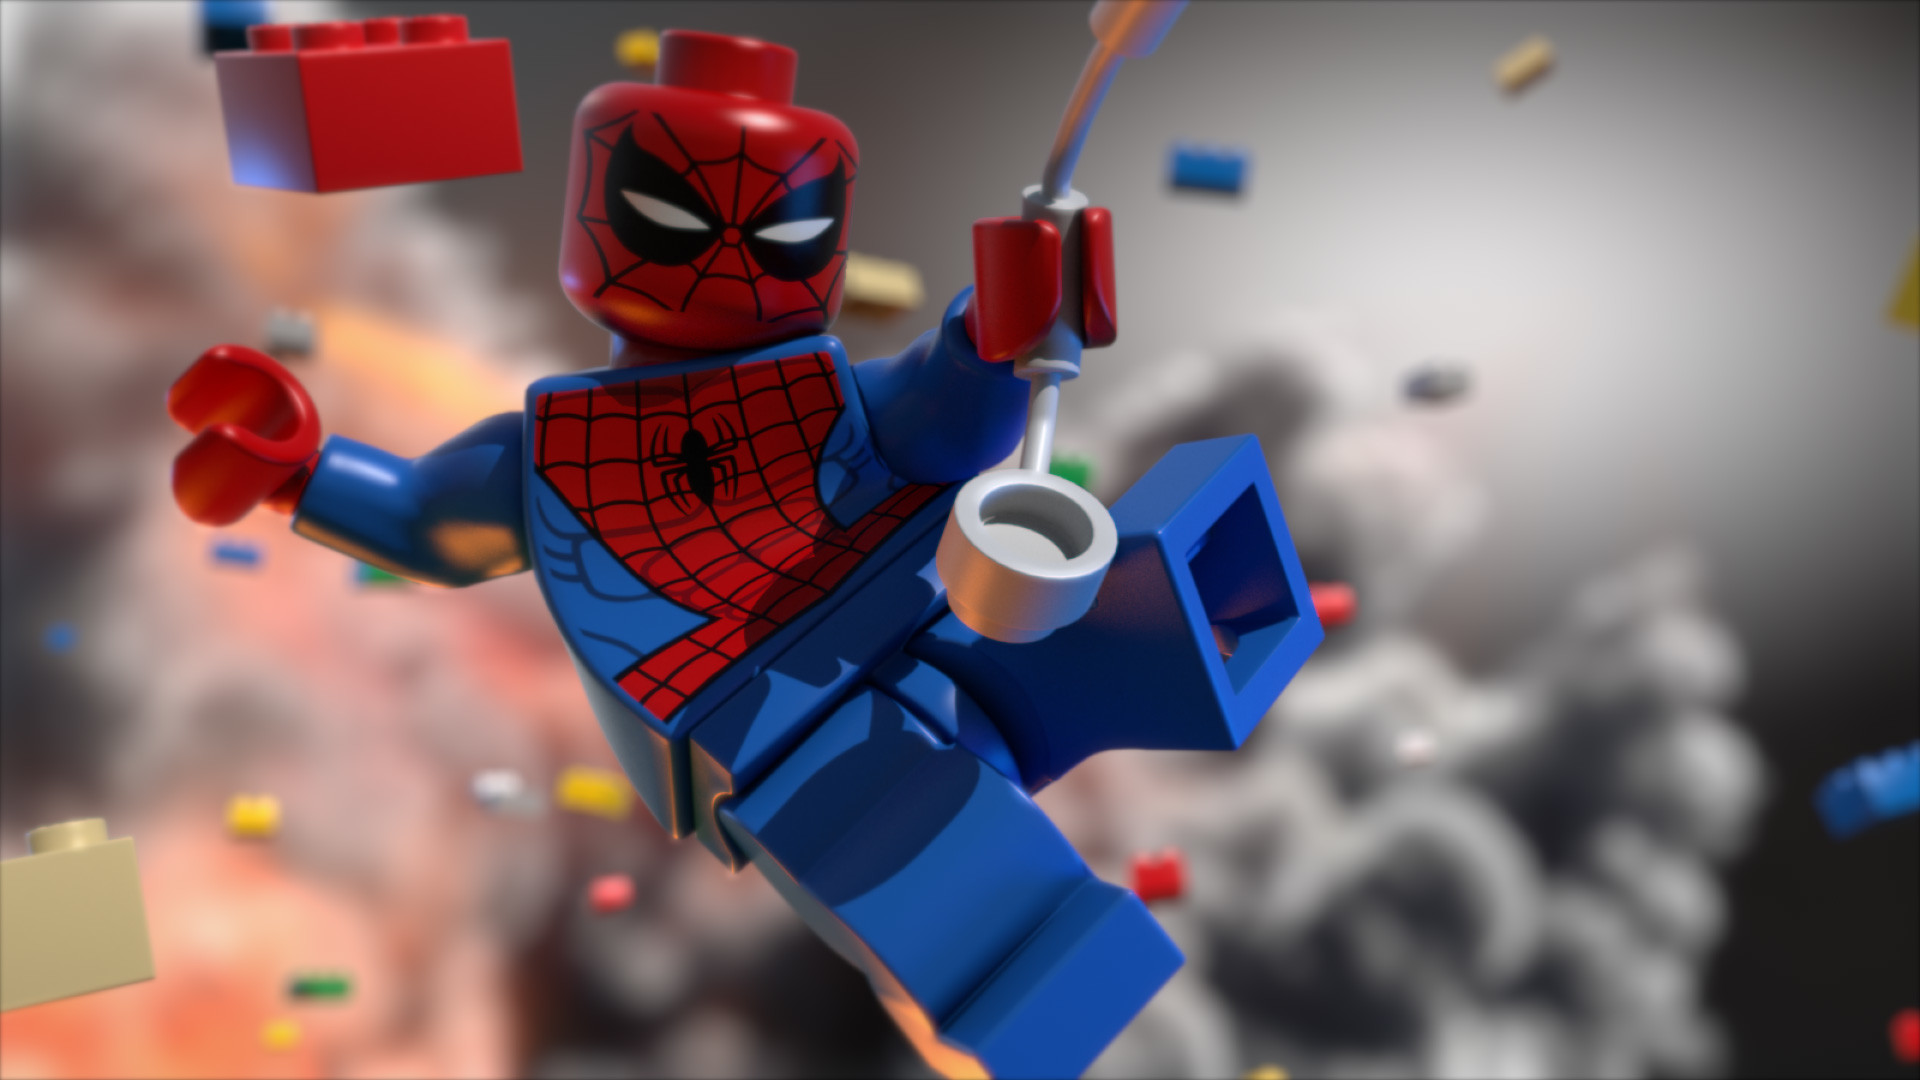 Lego-Logo-Wallpaper-0.jpg (1600×1000) | Lego | Pinterest | Lego and  Wallpaper